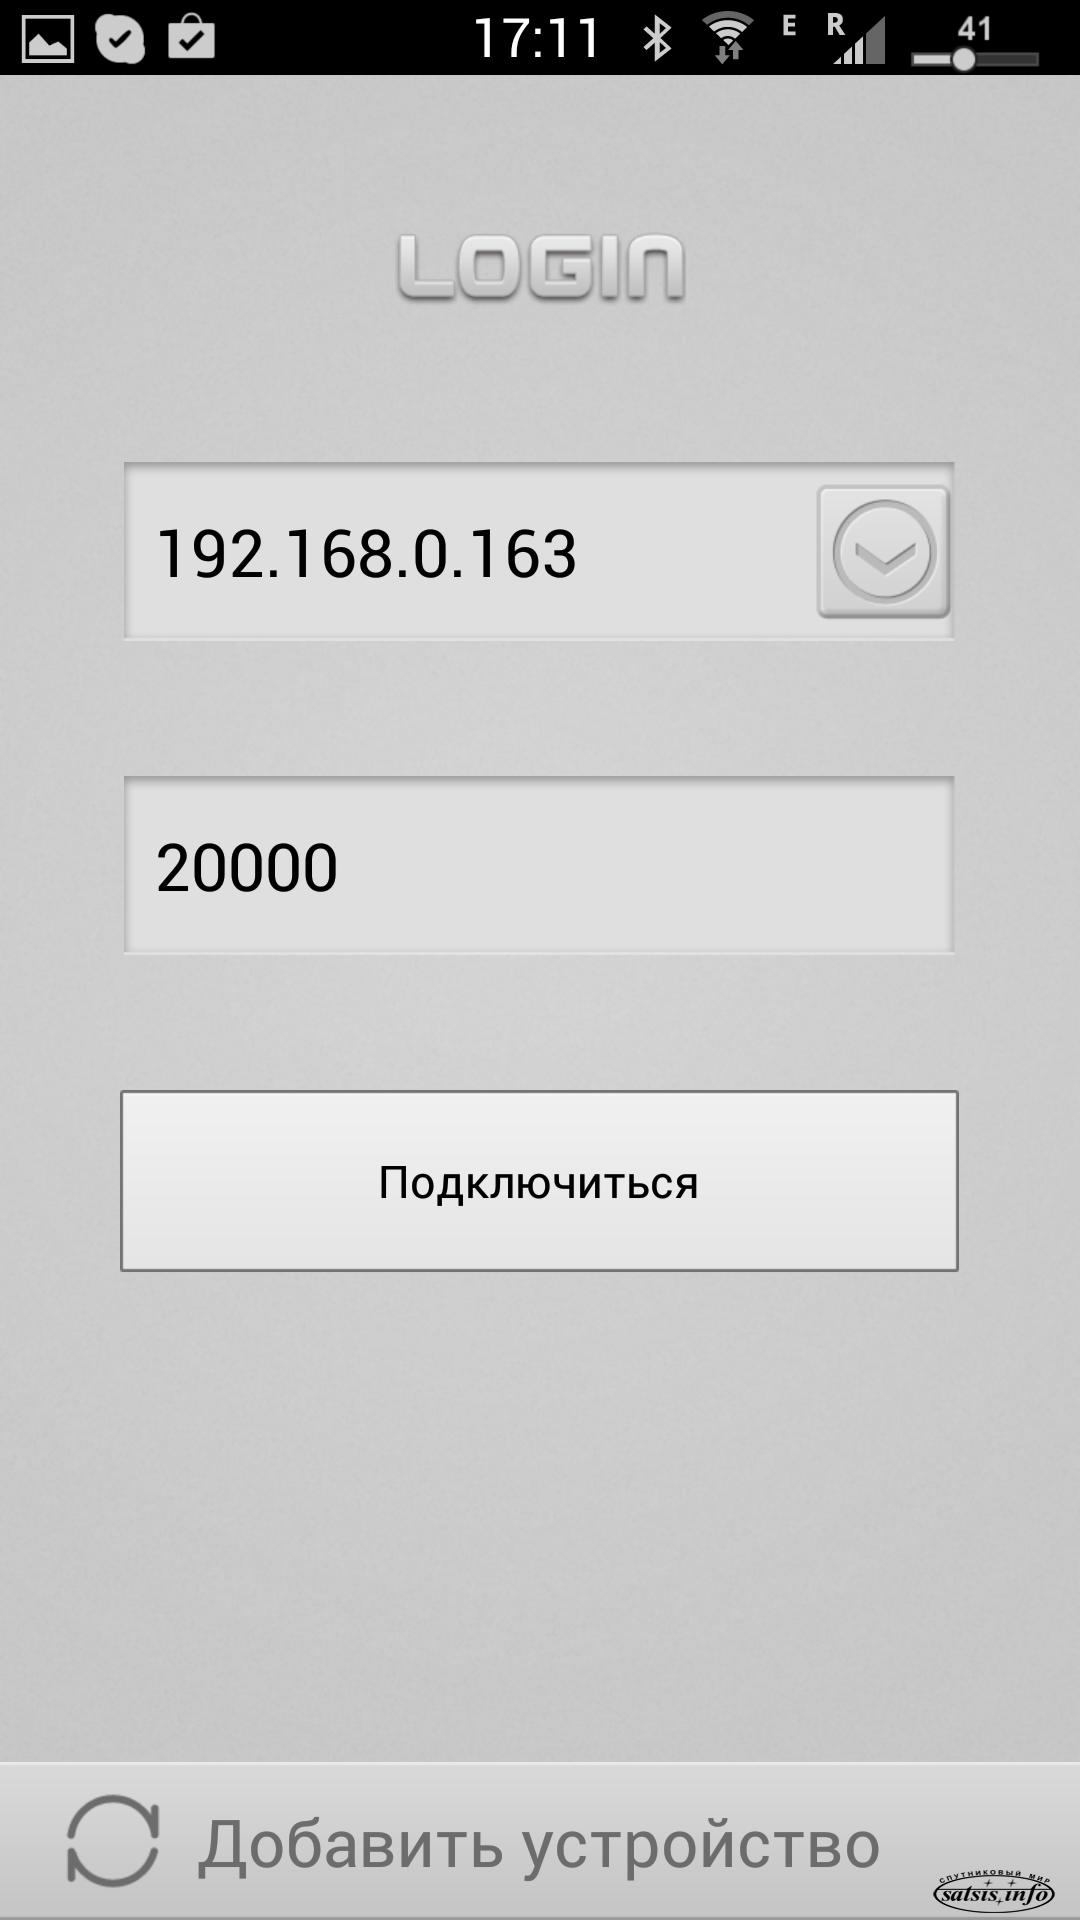 https://satsis.info/uploads/forum/posts/2014-06/1401808322_www.satsis.info_g_mscreen_1.png